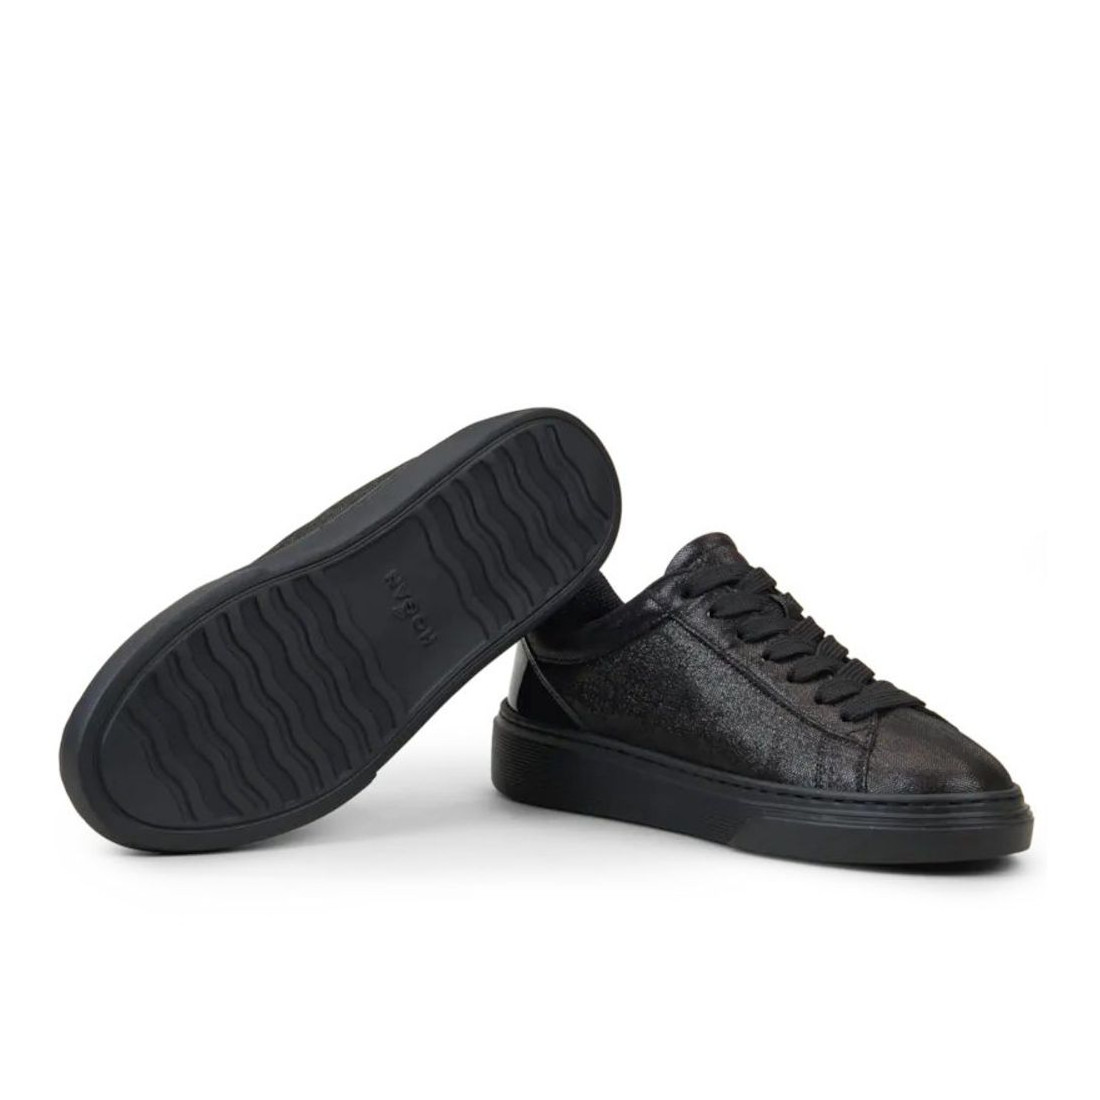 sneakers woman hogan hxw3650j971n58b999 7669